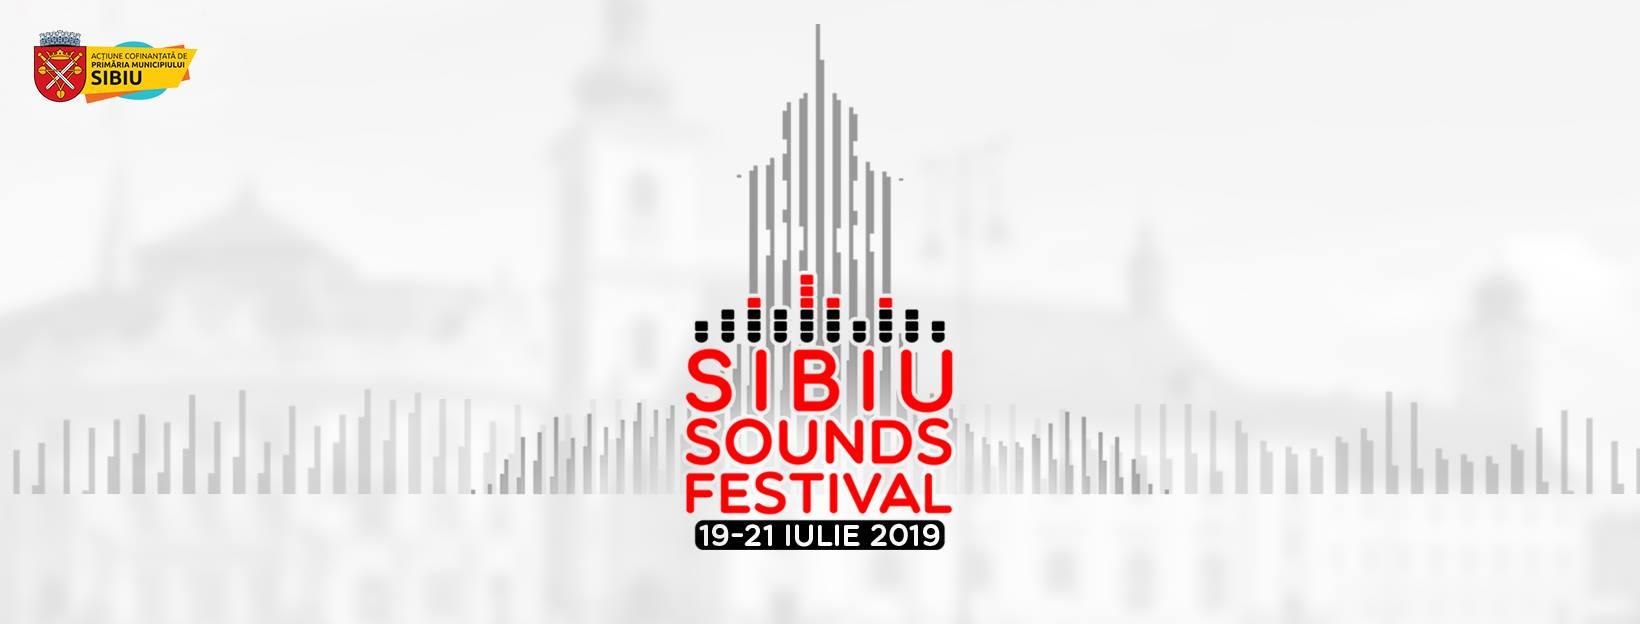 Sibiu Sounds Festival